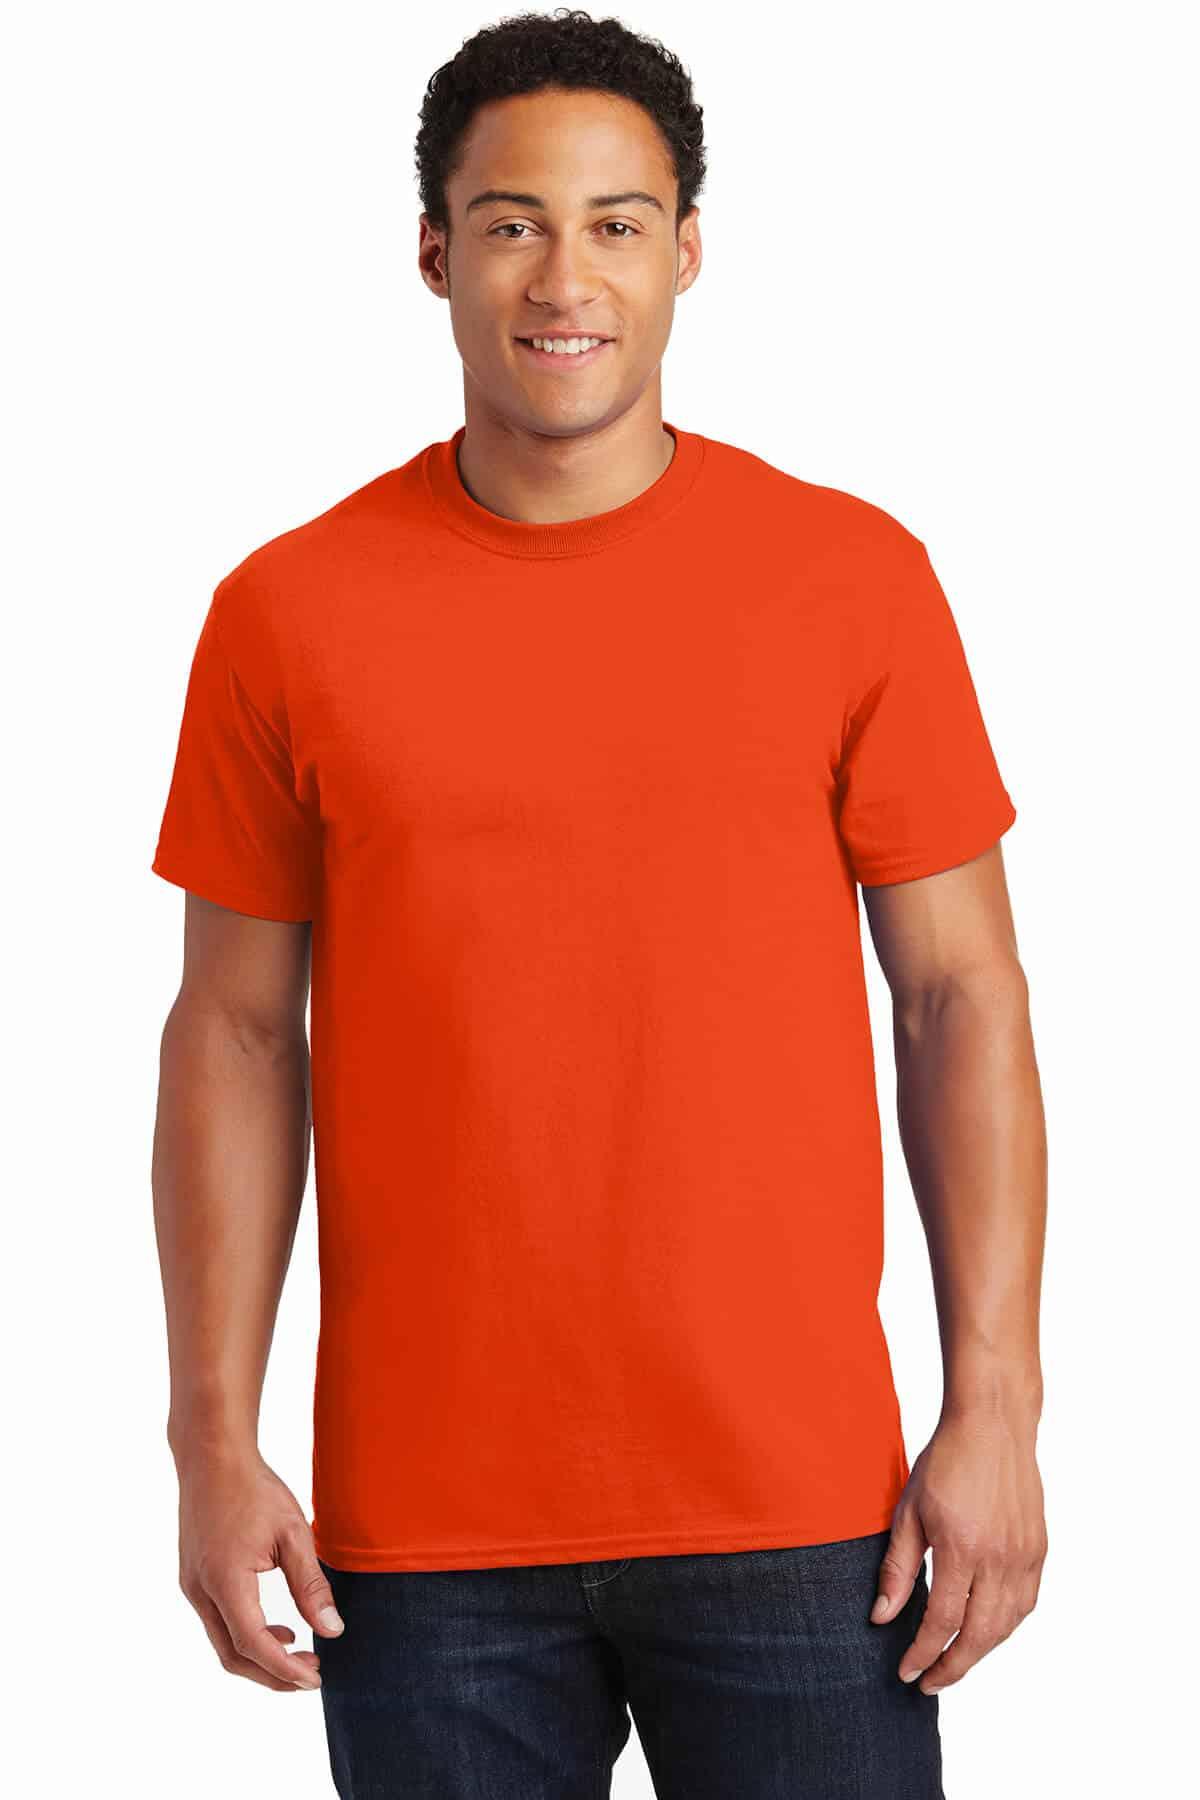 Orange TeeShirt Front